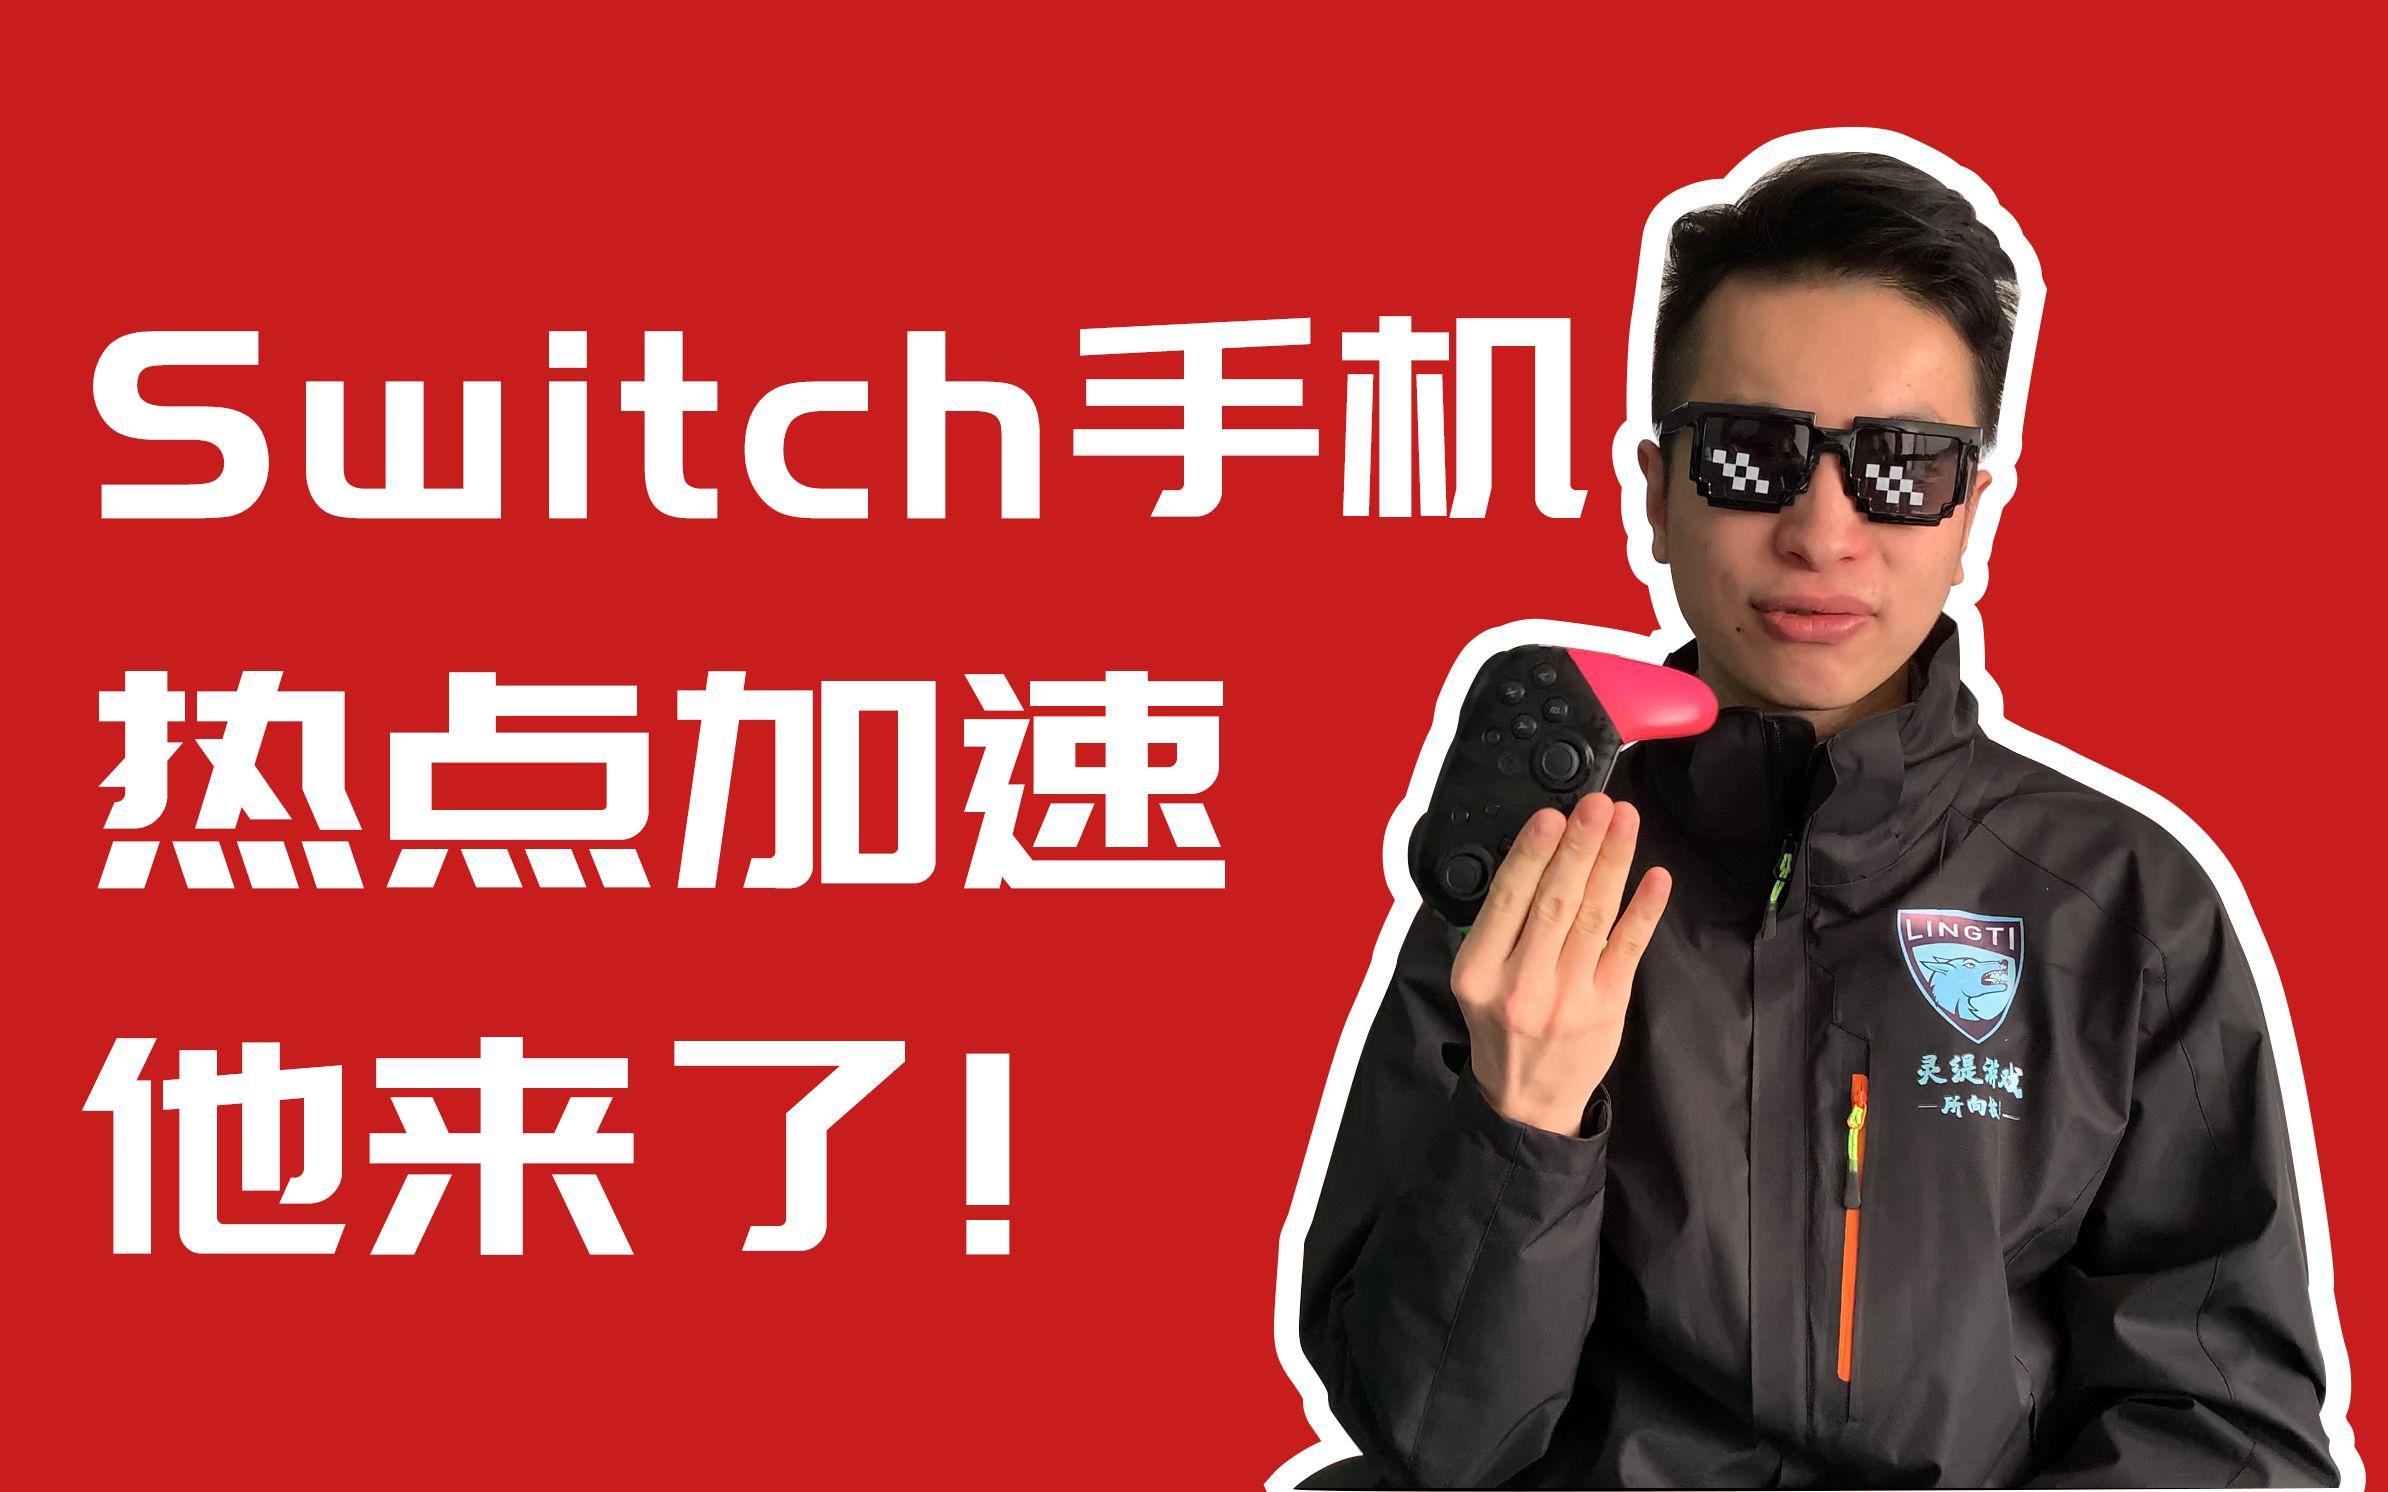 callmemaybe链接_【Switch手机热点加速】联网加速神器它来了-灵缇游戏加速工程